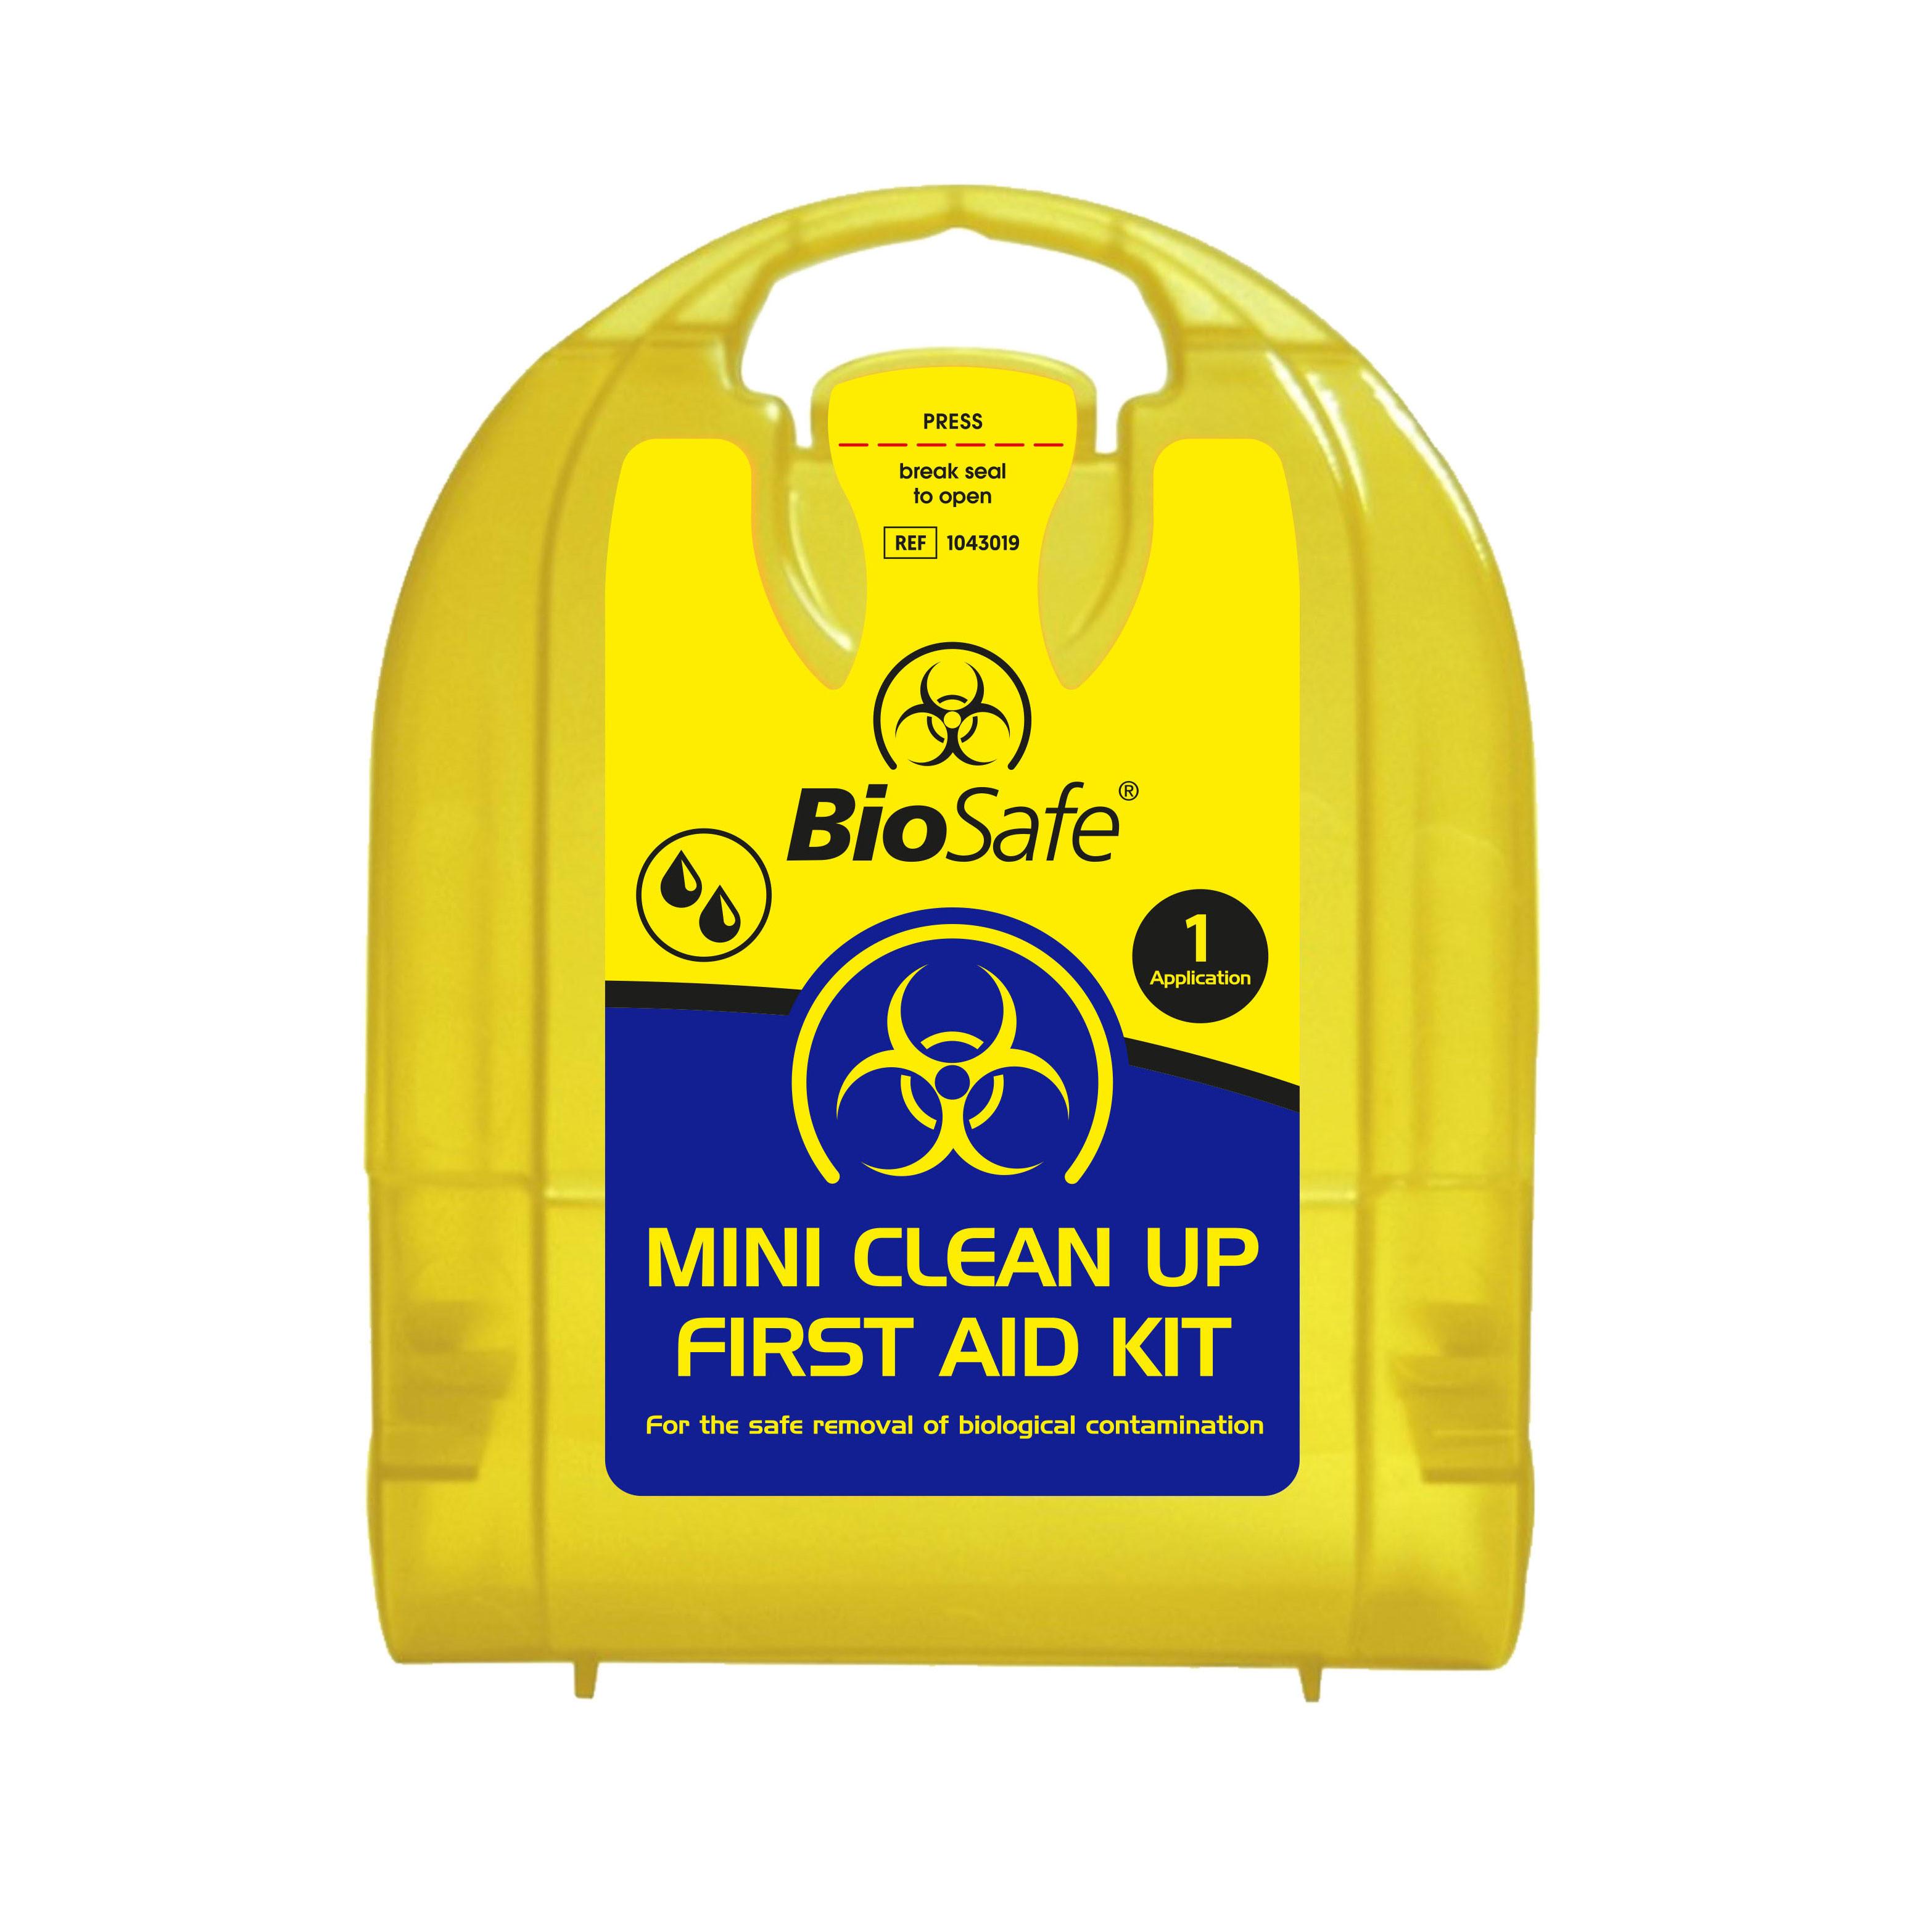 Mini Body Fluid Clean-Up Kit (1 Application - MICRO)